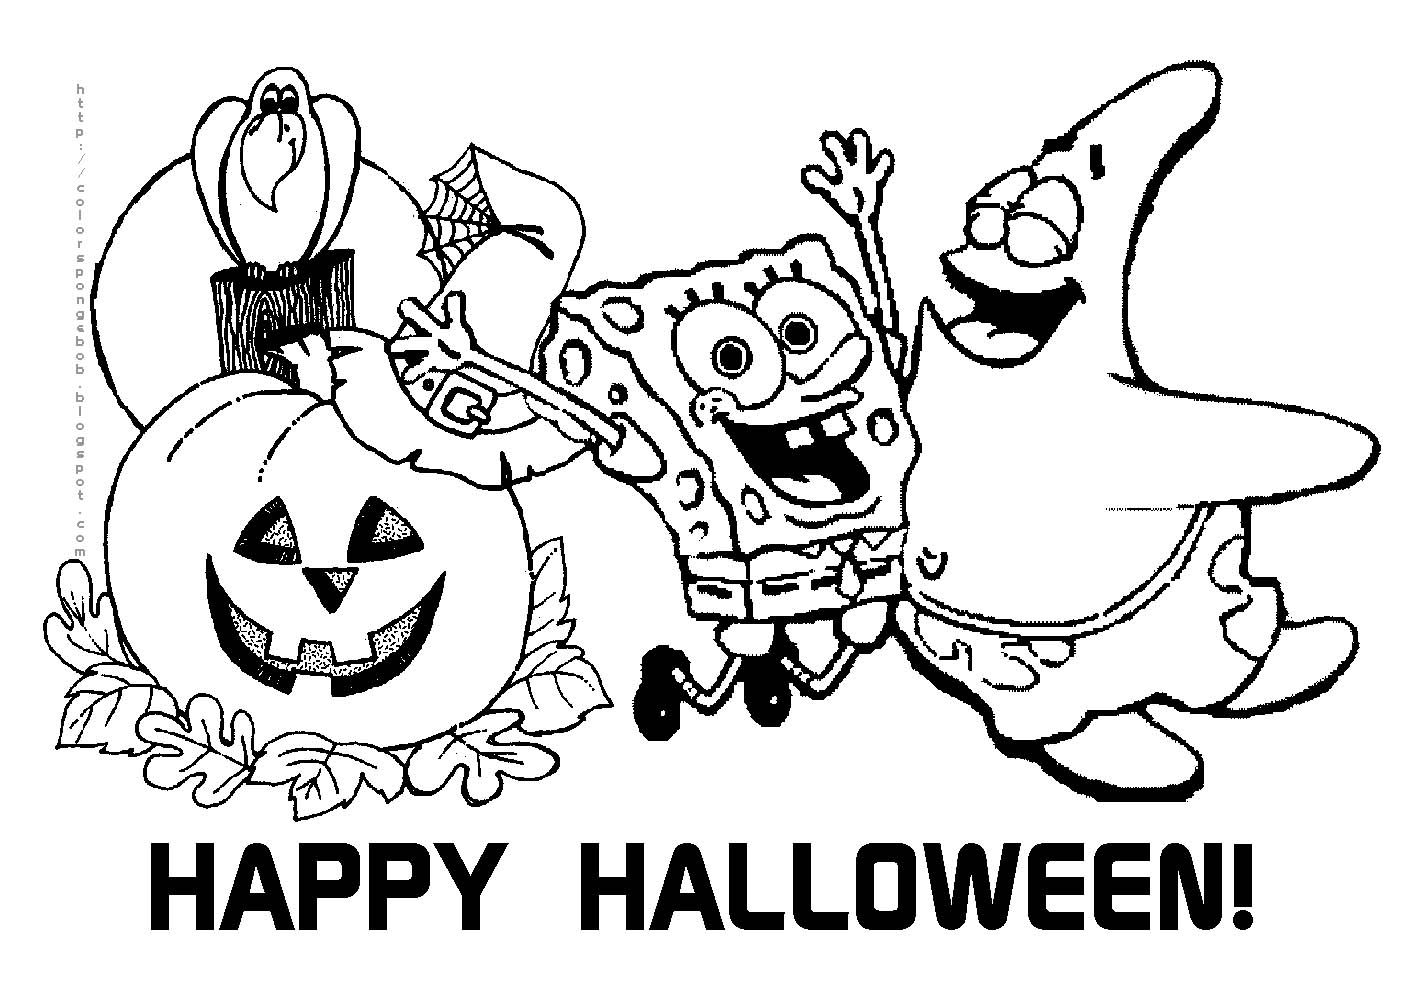 Spongebob Patrick Halloween Coloring Page Halloween Coloring Pages Free Halloween Coloring Pages Elmo Coloring Pages